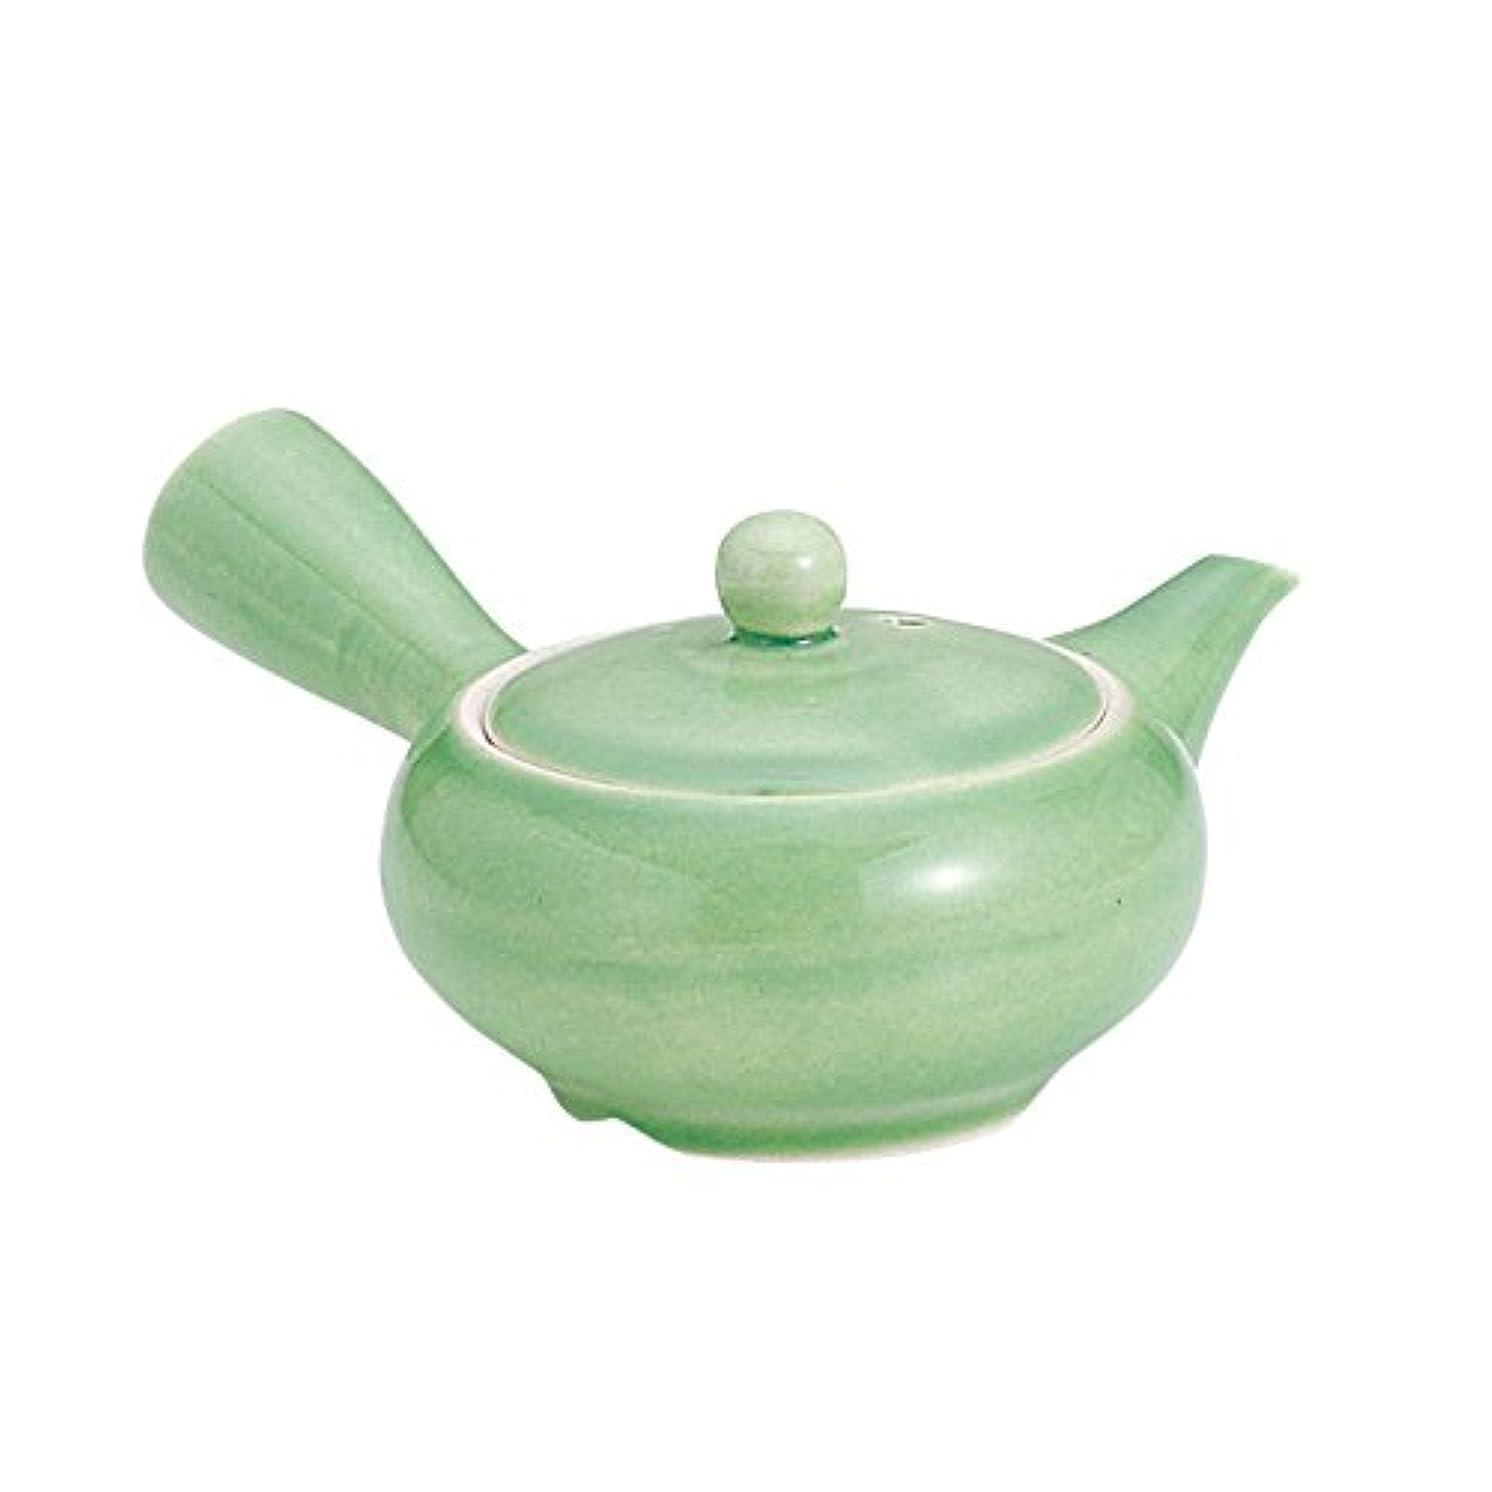 Tokyo Matcha Selection - [VALUE Mini Kyusu : 3 Color (60cc) Parallel Steel Mesh Type - Japanese Tea Pot (Green) [Standard ship by SAL: NO Tracking & Insurance]